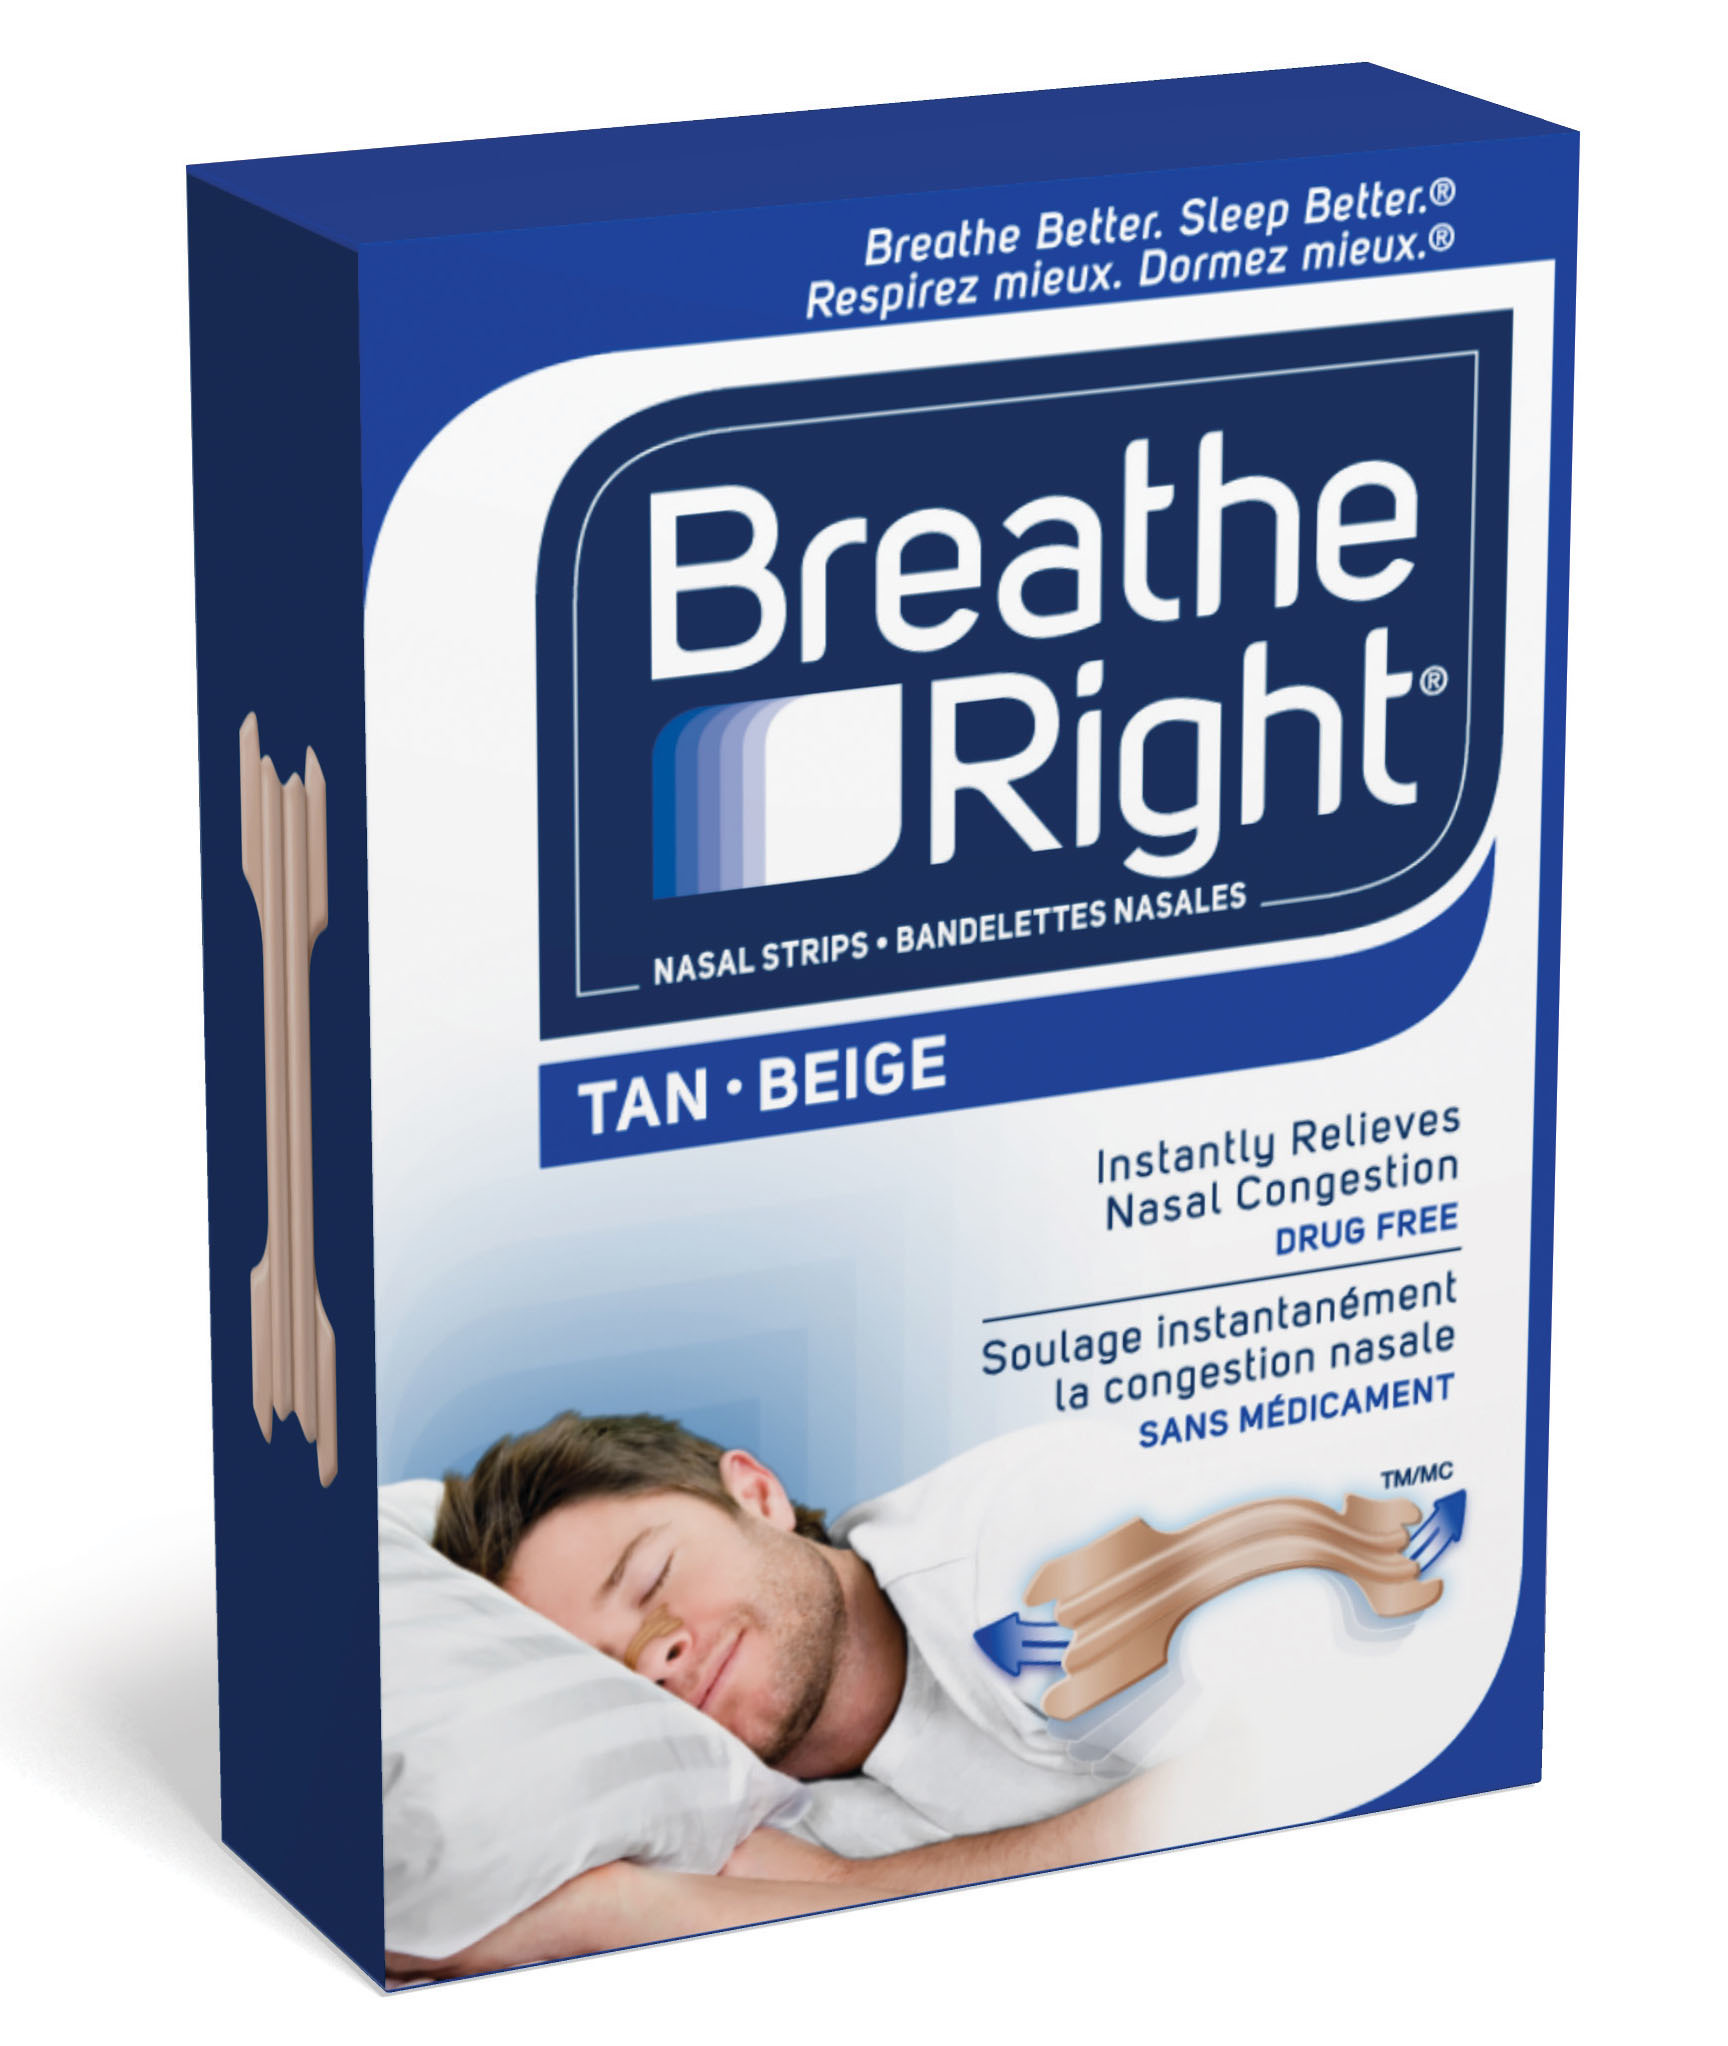 Breathe right nasal strips reviews